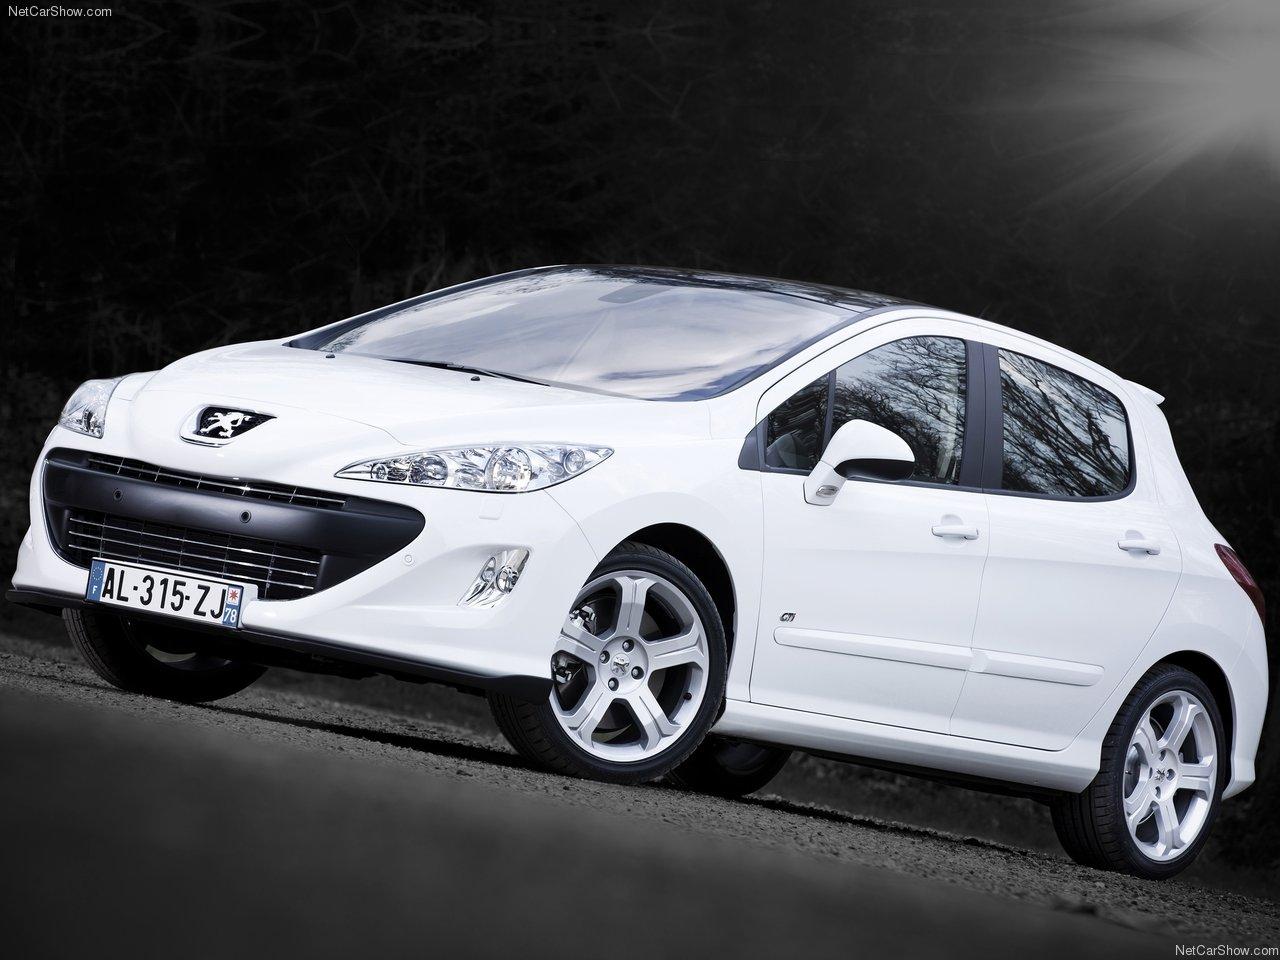 http://3.bp.blogspot.com/_lsyt_wQ2awY/TDsZzHdxN0I/AAAAAAAB98k/tVIE4ppGous/s1600/Peugeot-308_GTi_2011_1280x960_wallpaper_04.jpg